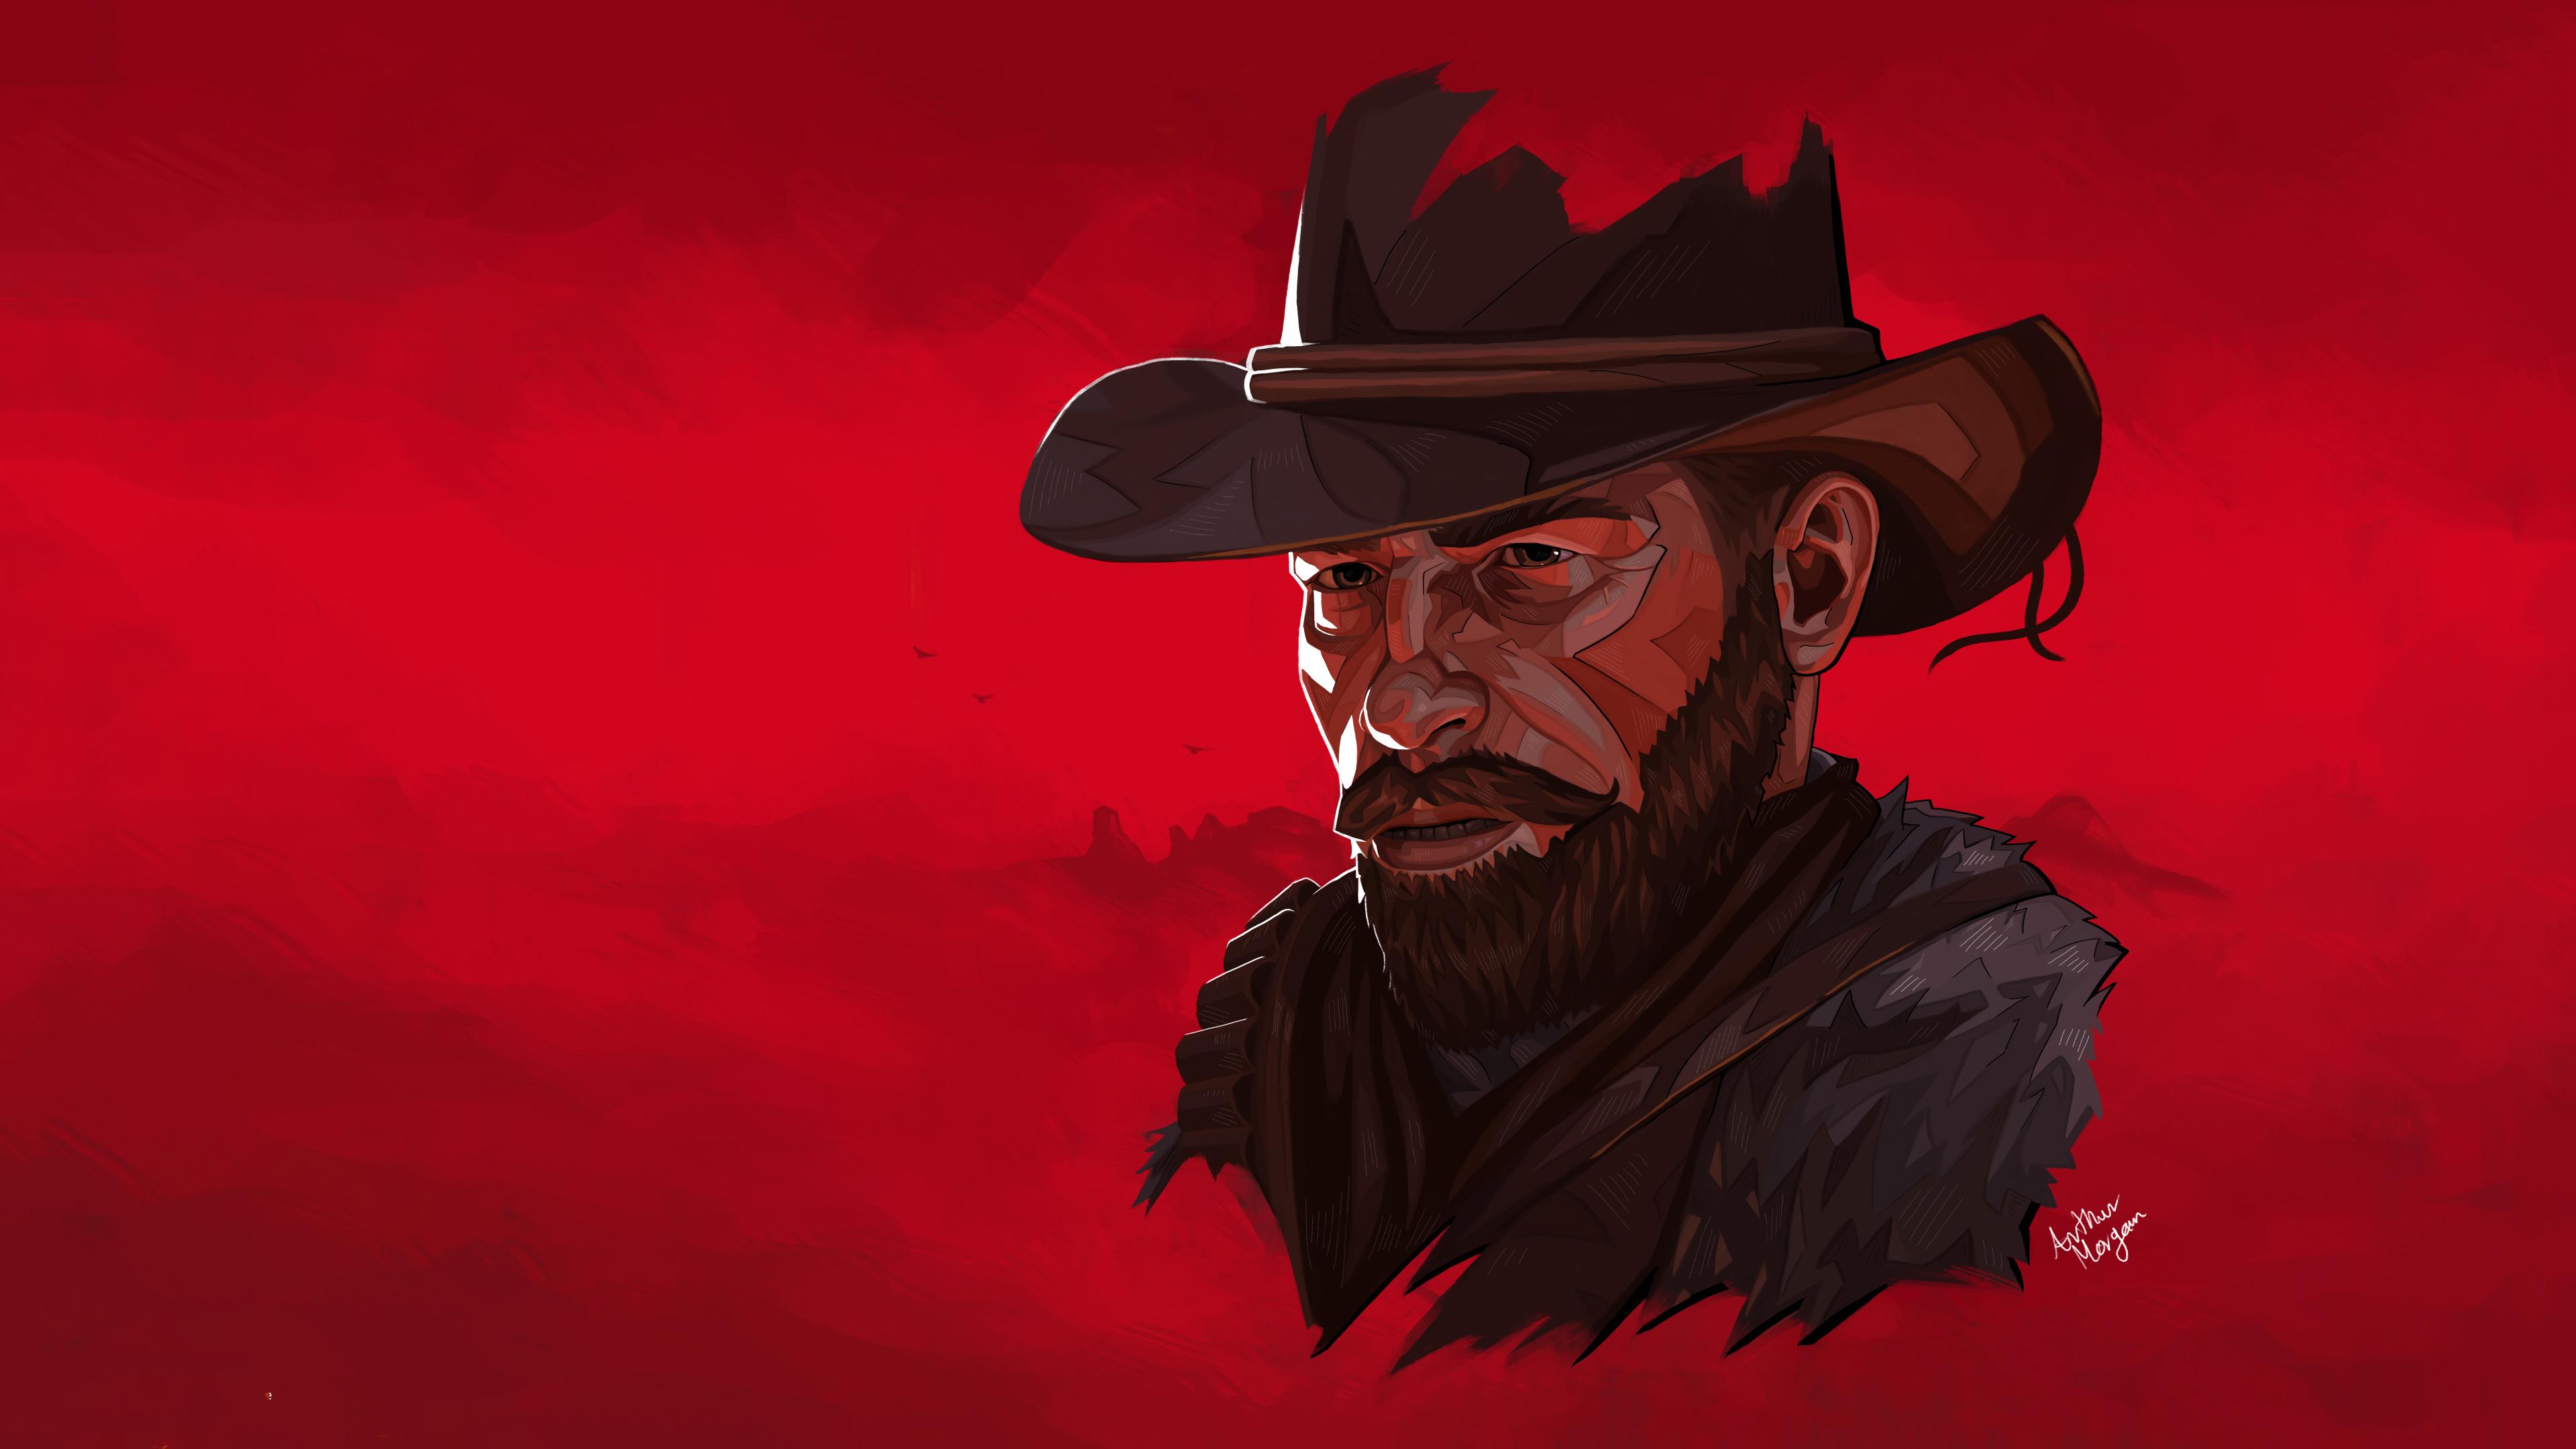 Red Dead Redemption 2 4k Ultra Hd Wallpaper Background Image